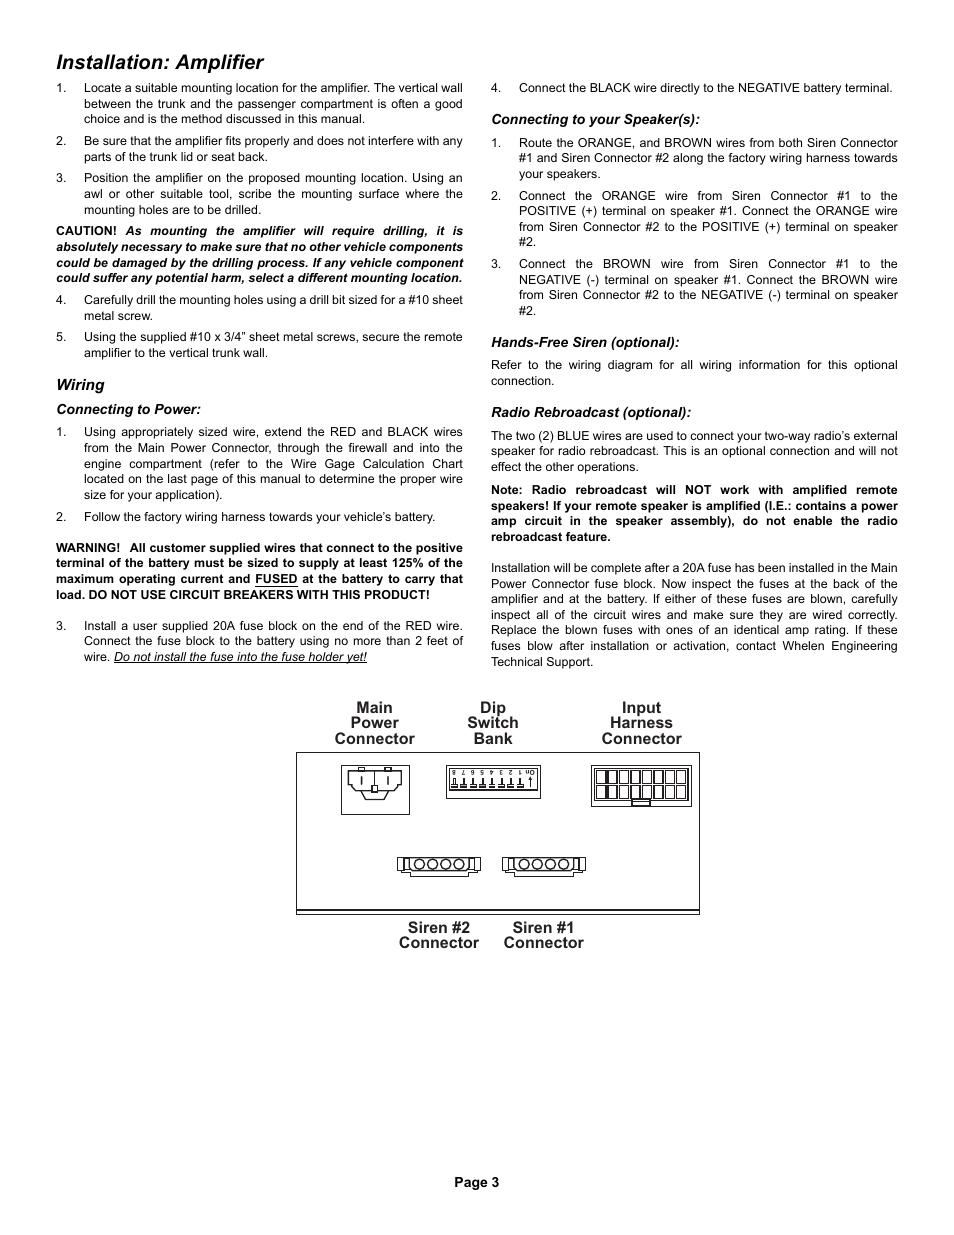 Installation Amplifier Whelen 295hfsa7 User Manual Page 3 8 Switch Box Wiring Diagram